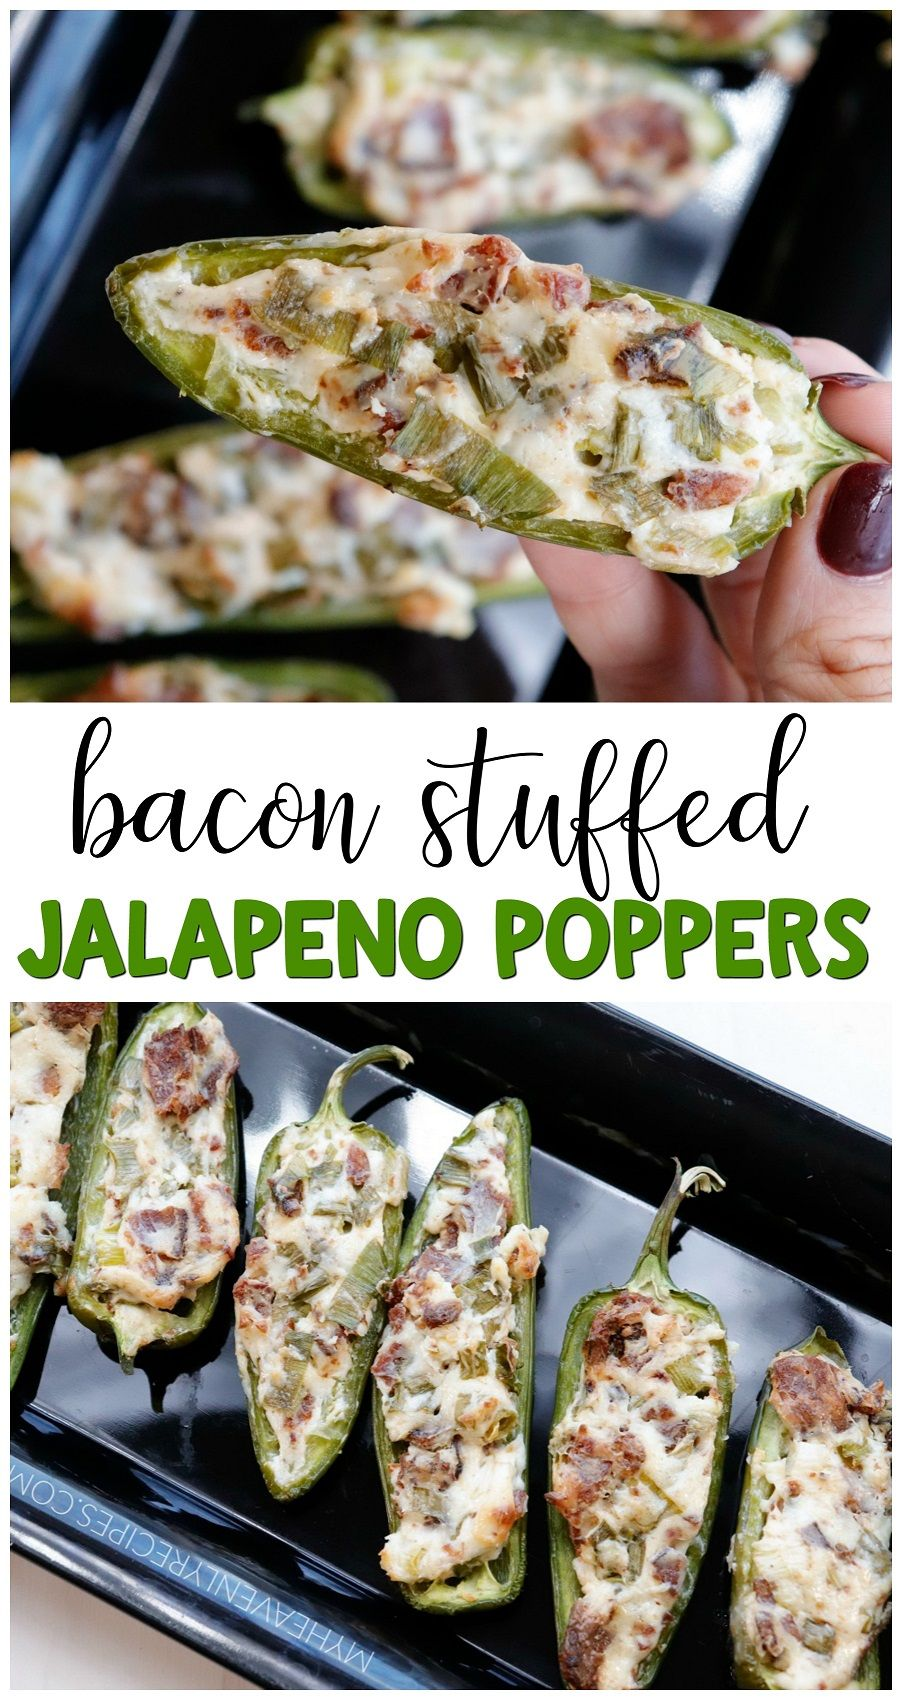 Bacon Stuffed Jalapeno Poppers Recipe